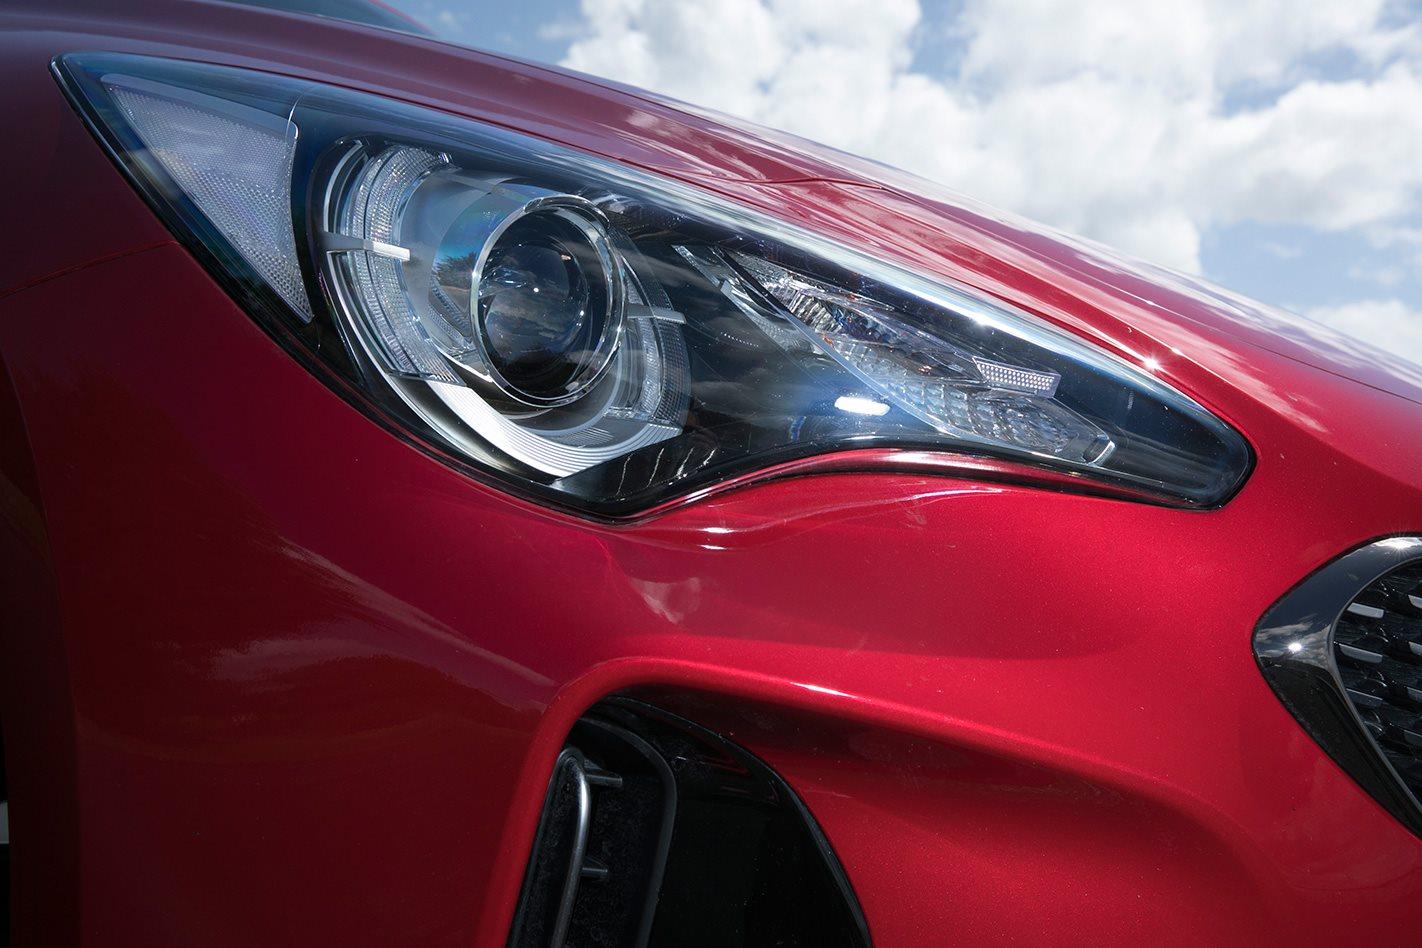 2017 Kia Stinger 330S headlights.jpg